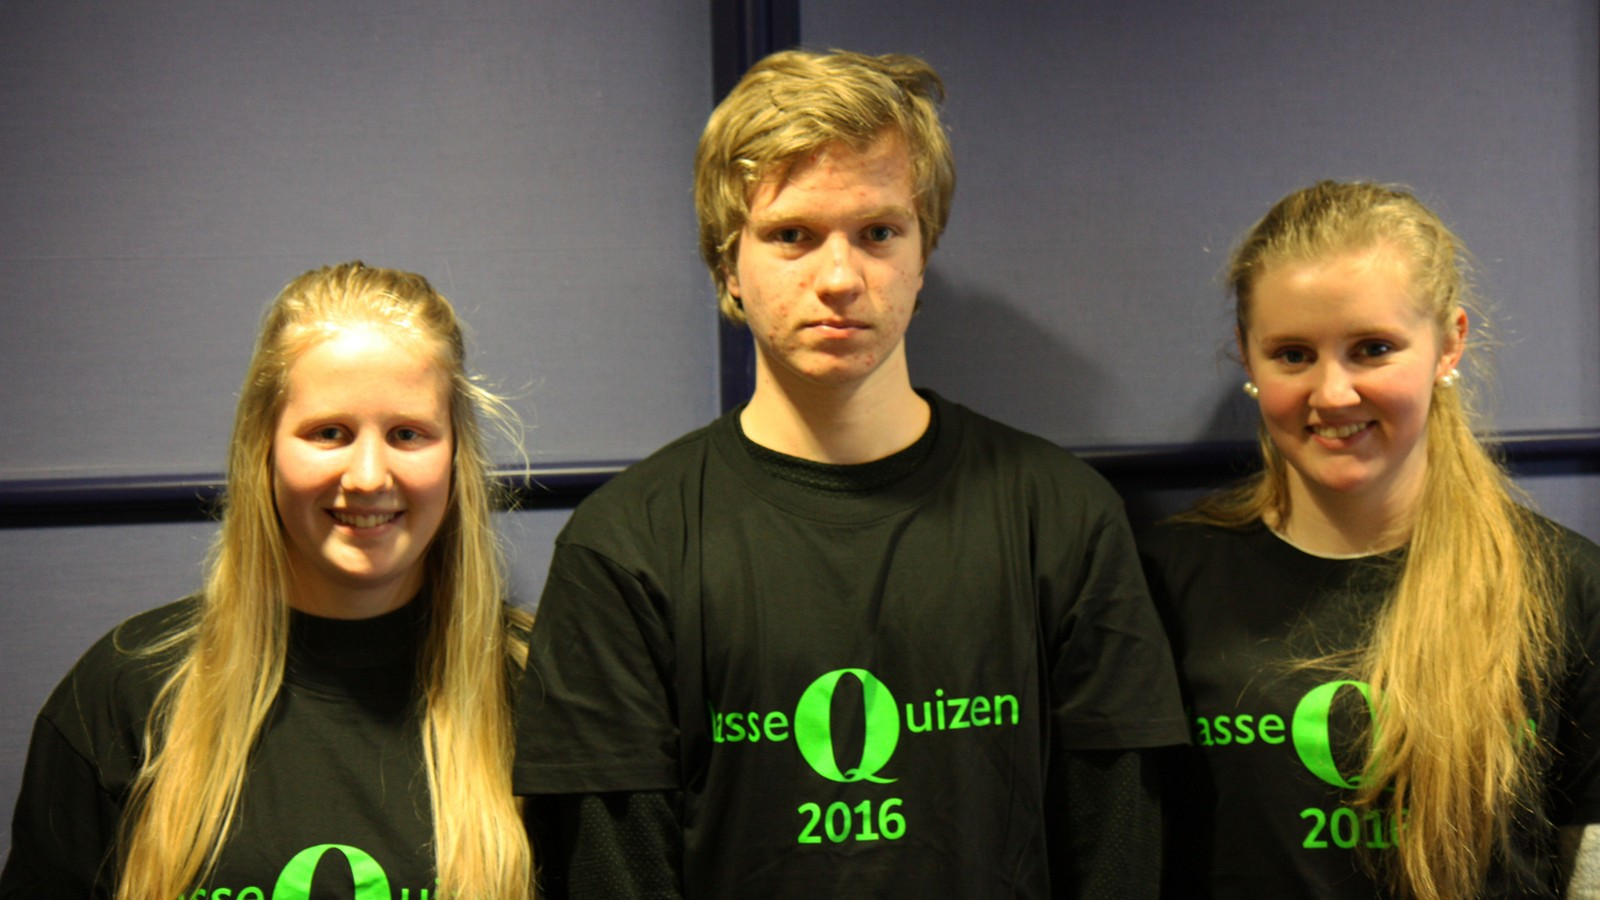 NI POENG: Anette Espevik, Eirik Dørheim og Guro Emilie Øglænd fra Ølen skule.